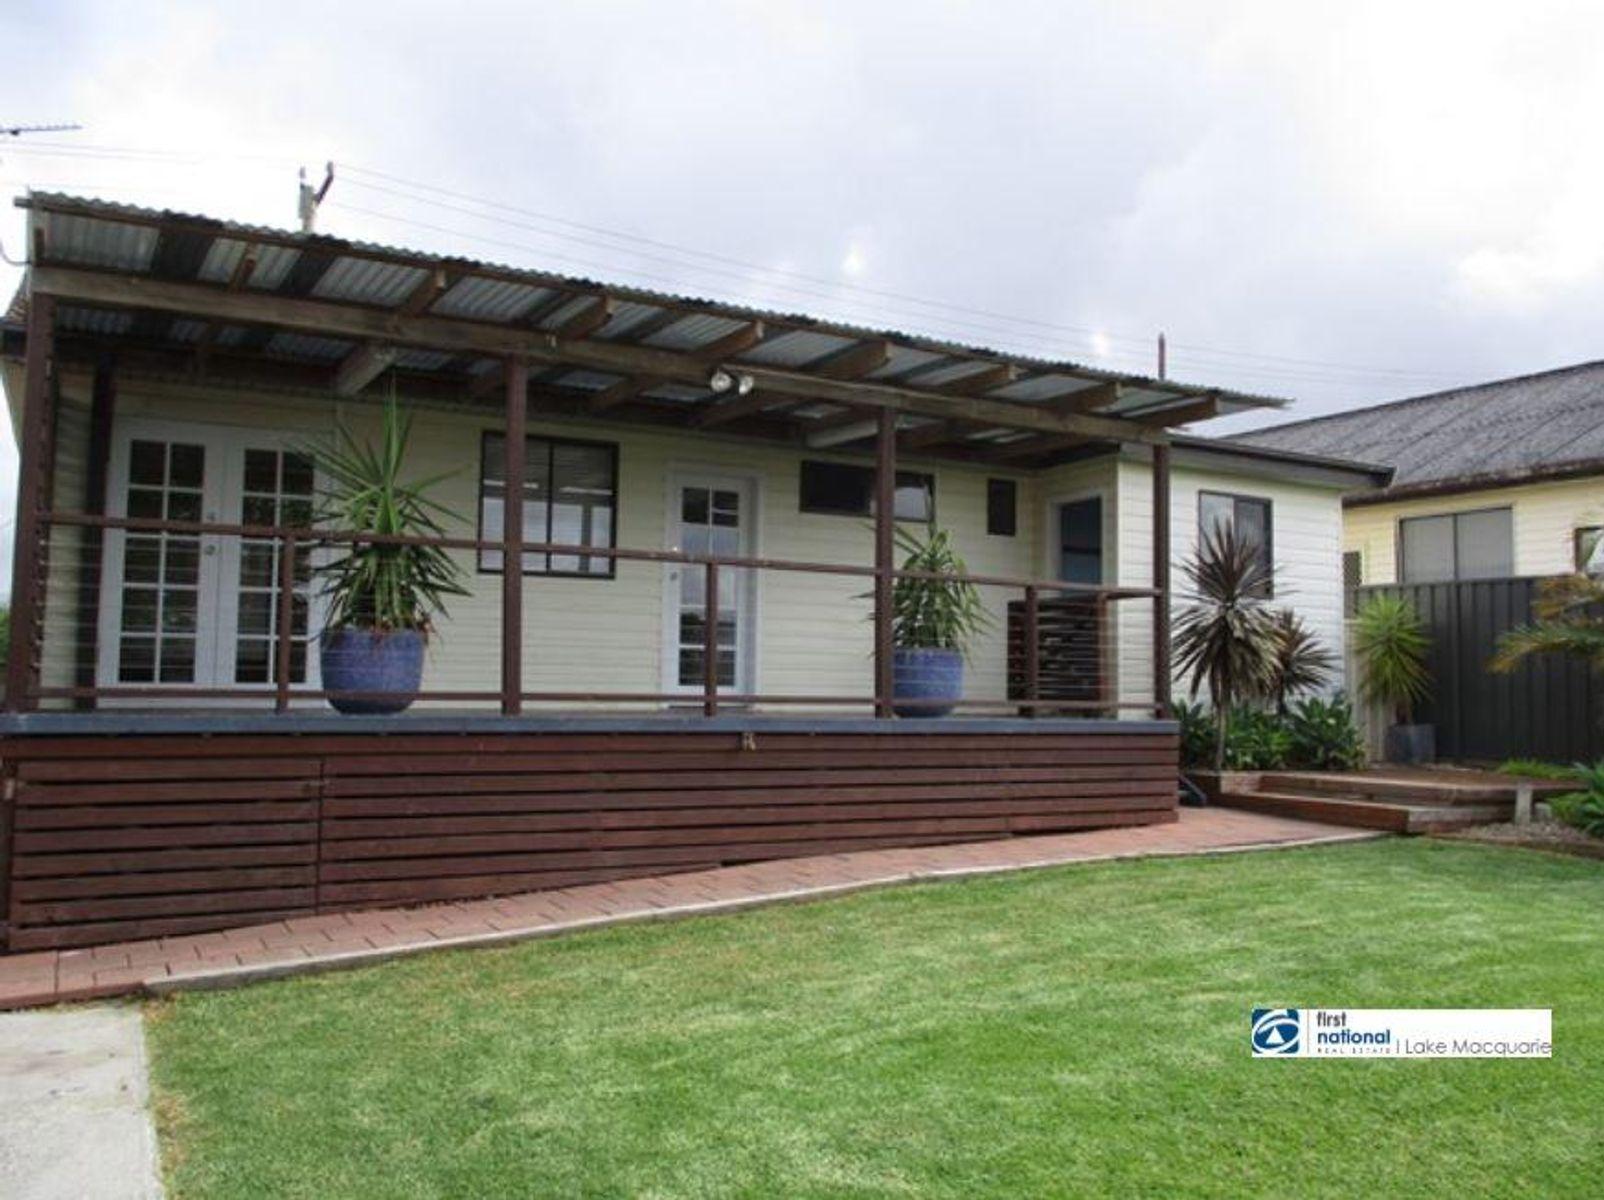 edwards windsor tenancy application form